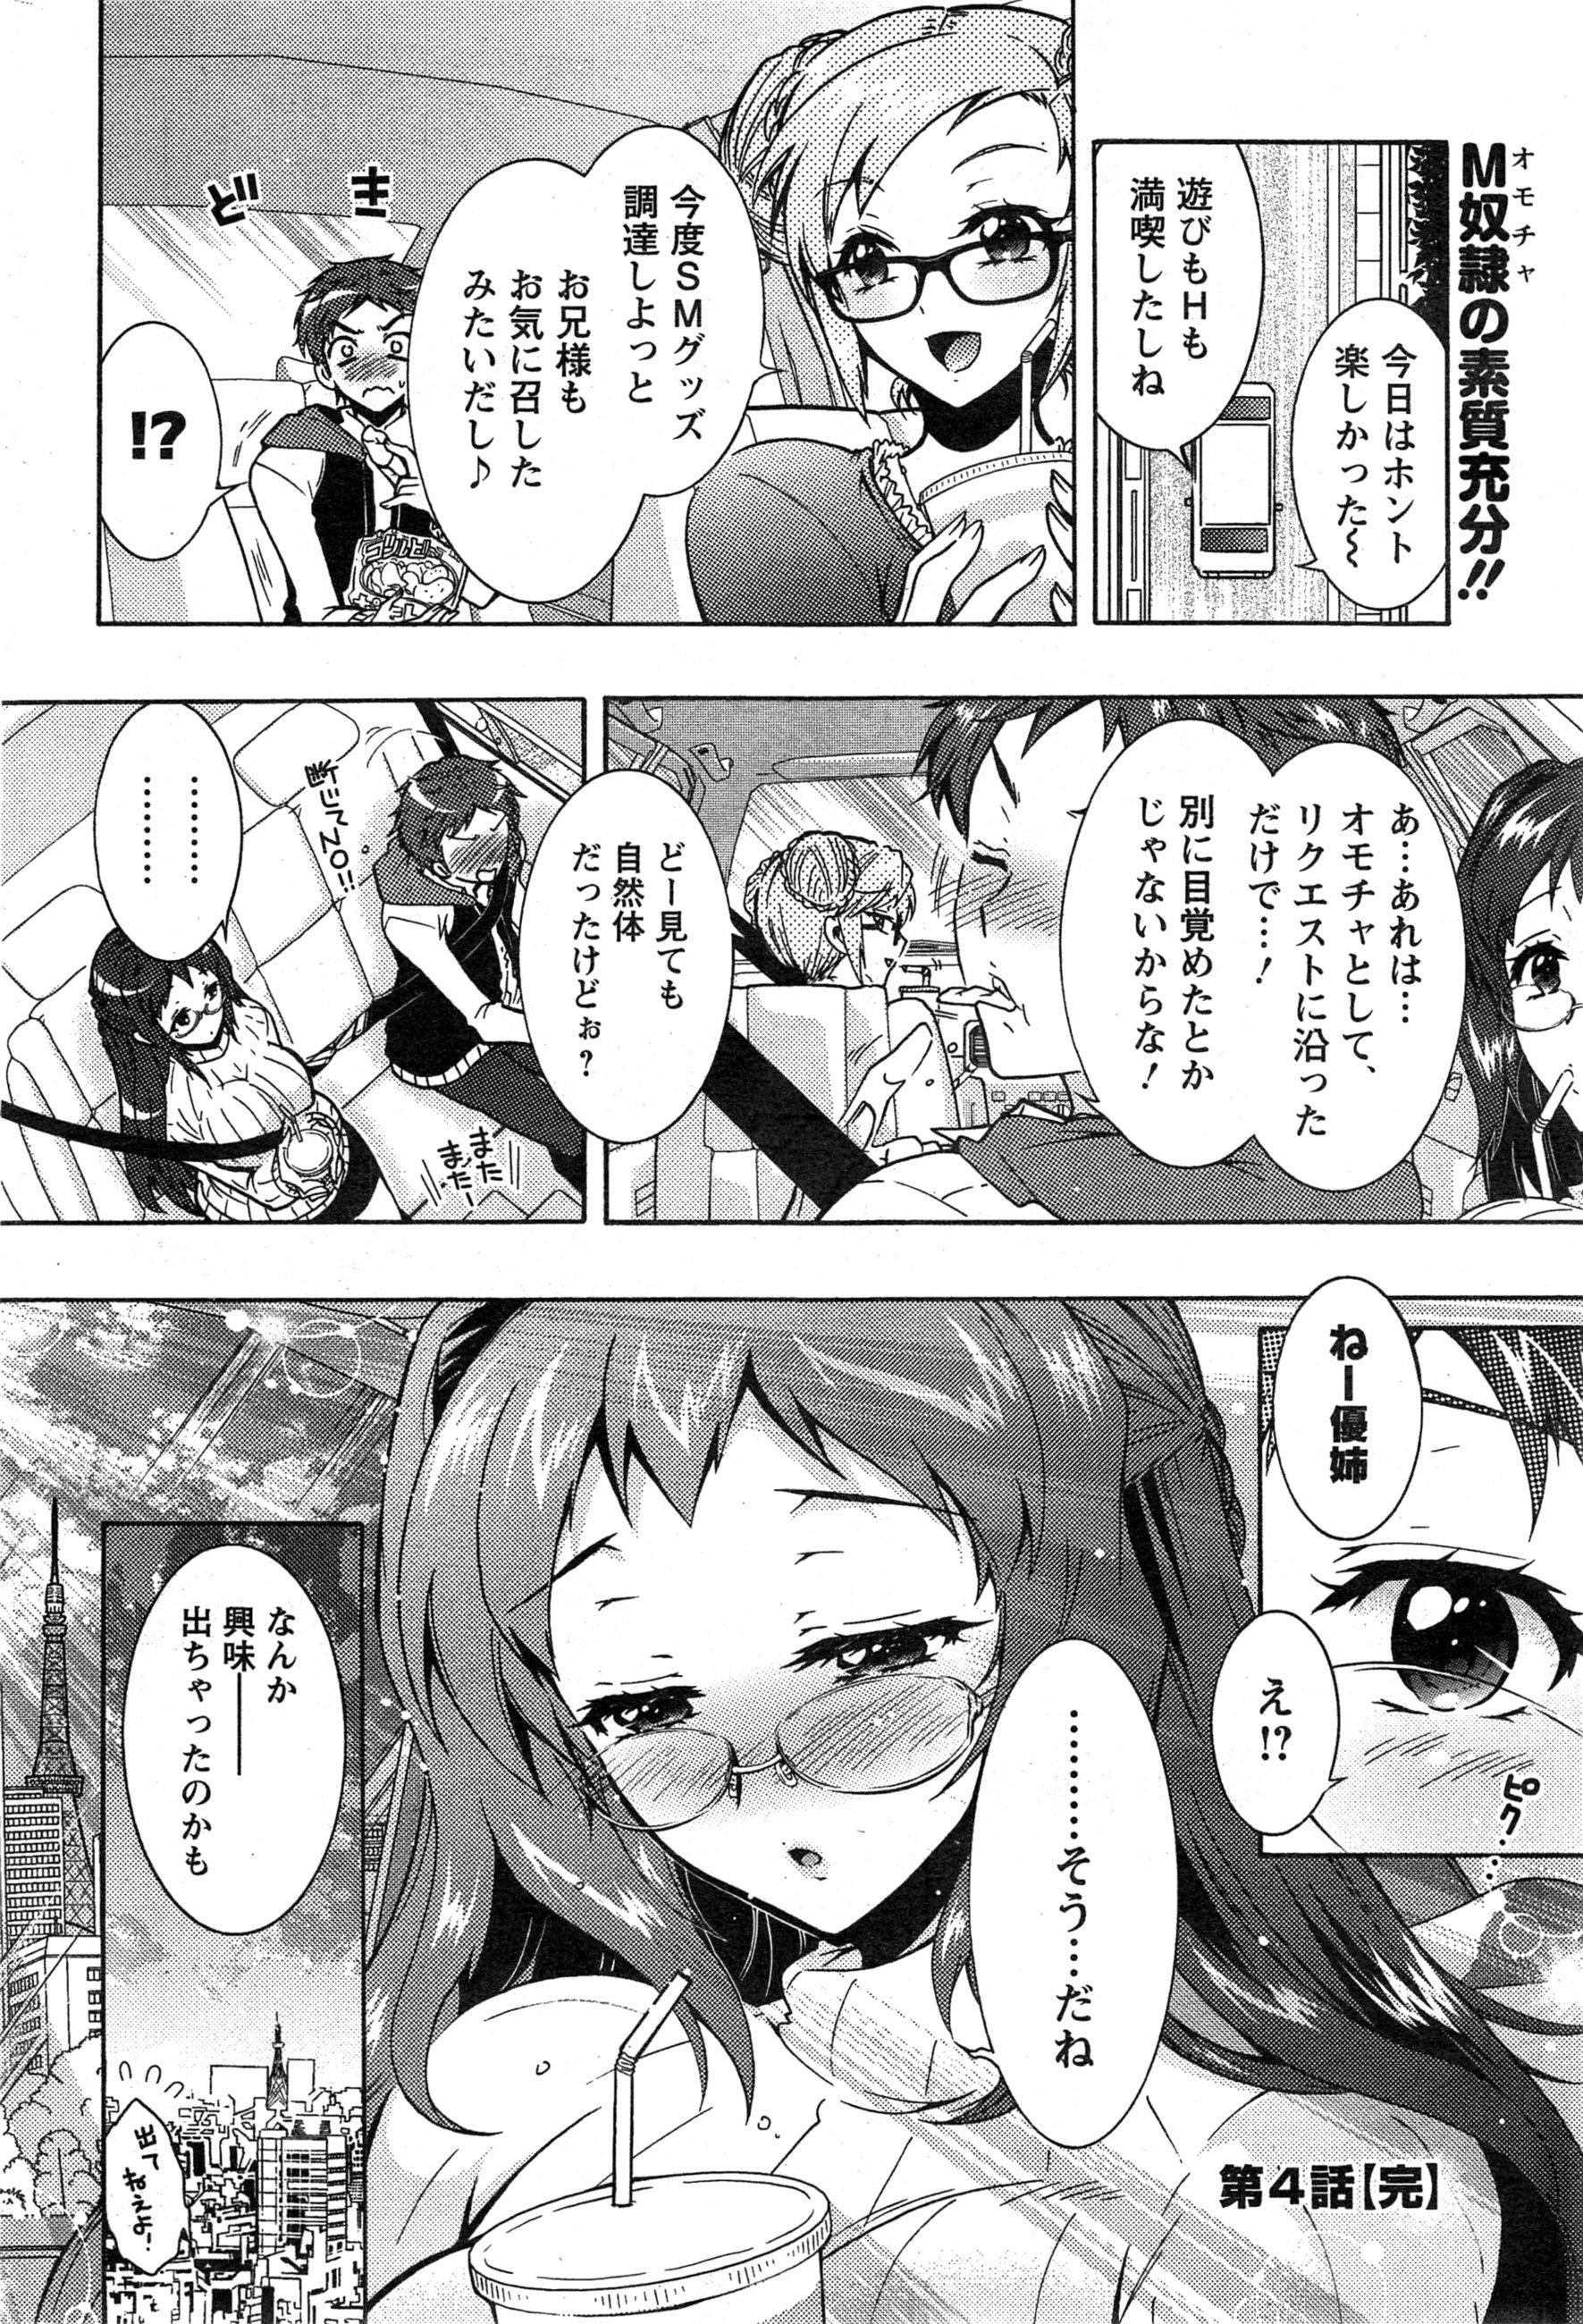 [Honda Arima] Sanshimai no Omocha - The Slave of Three Sisters Ch. 1-6 74